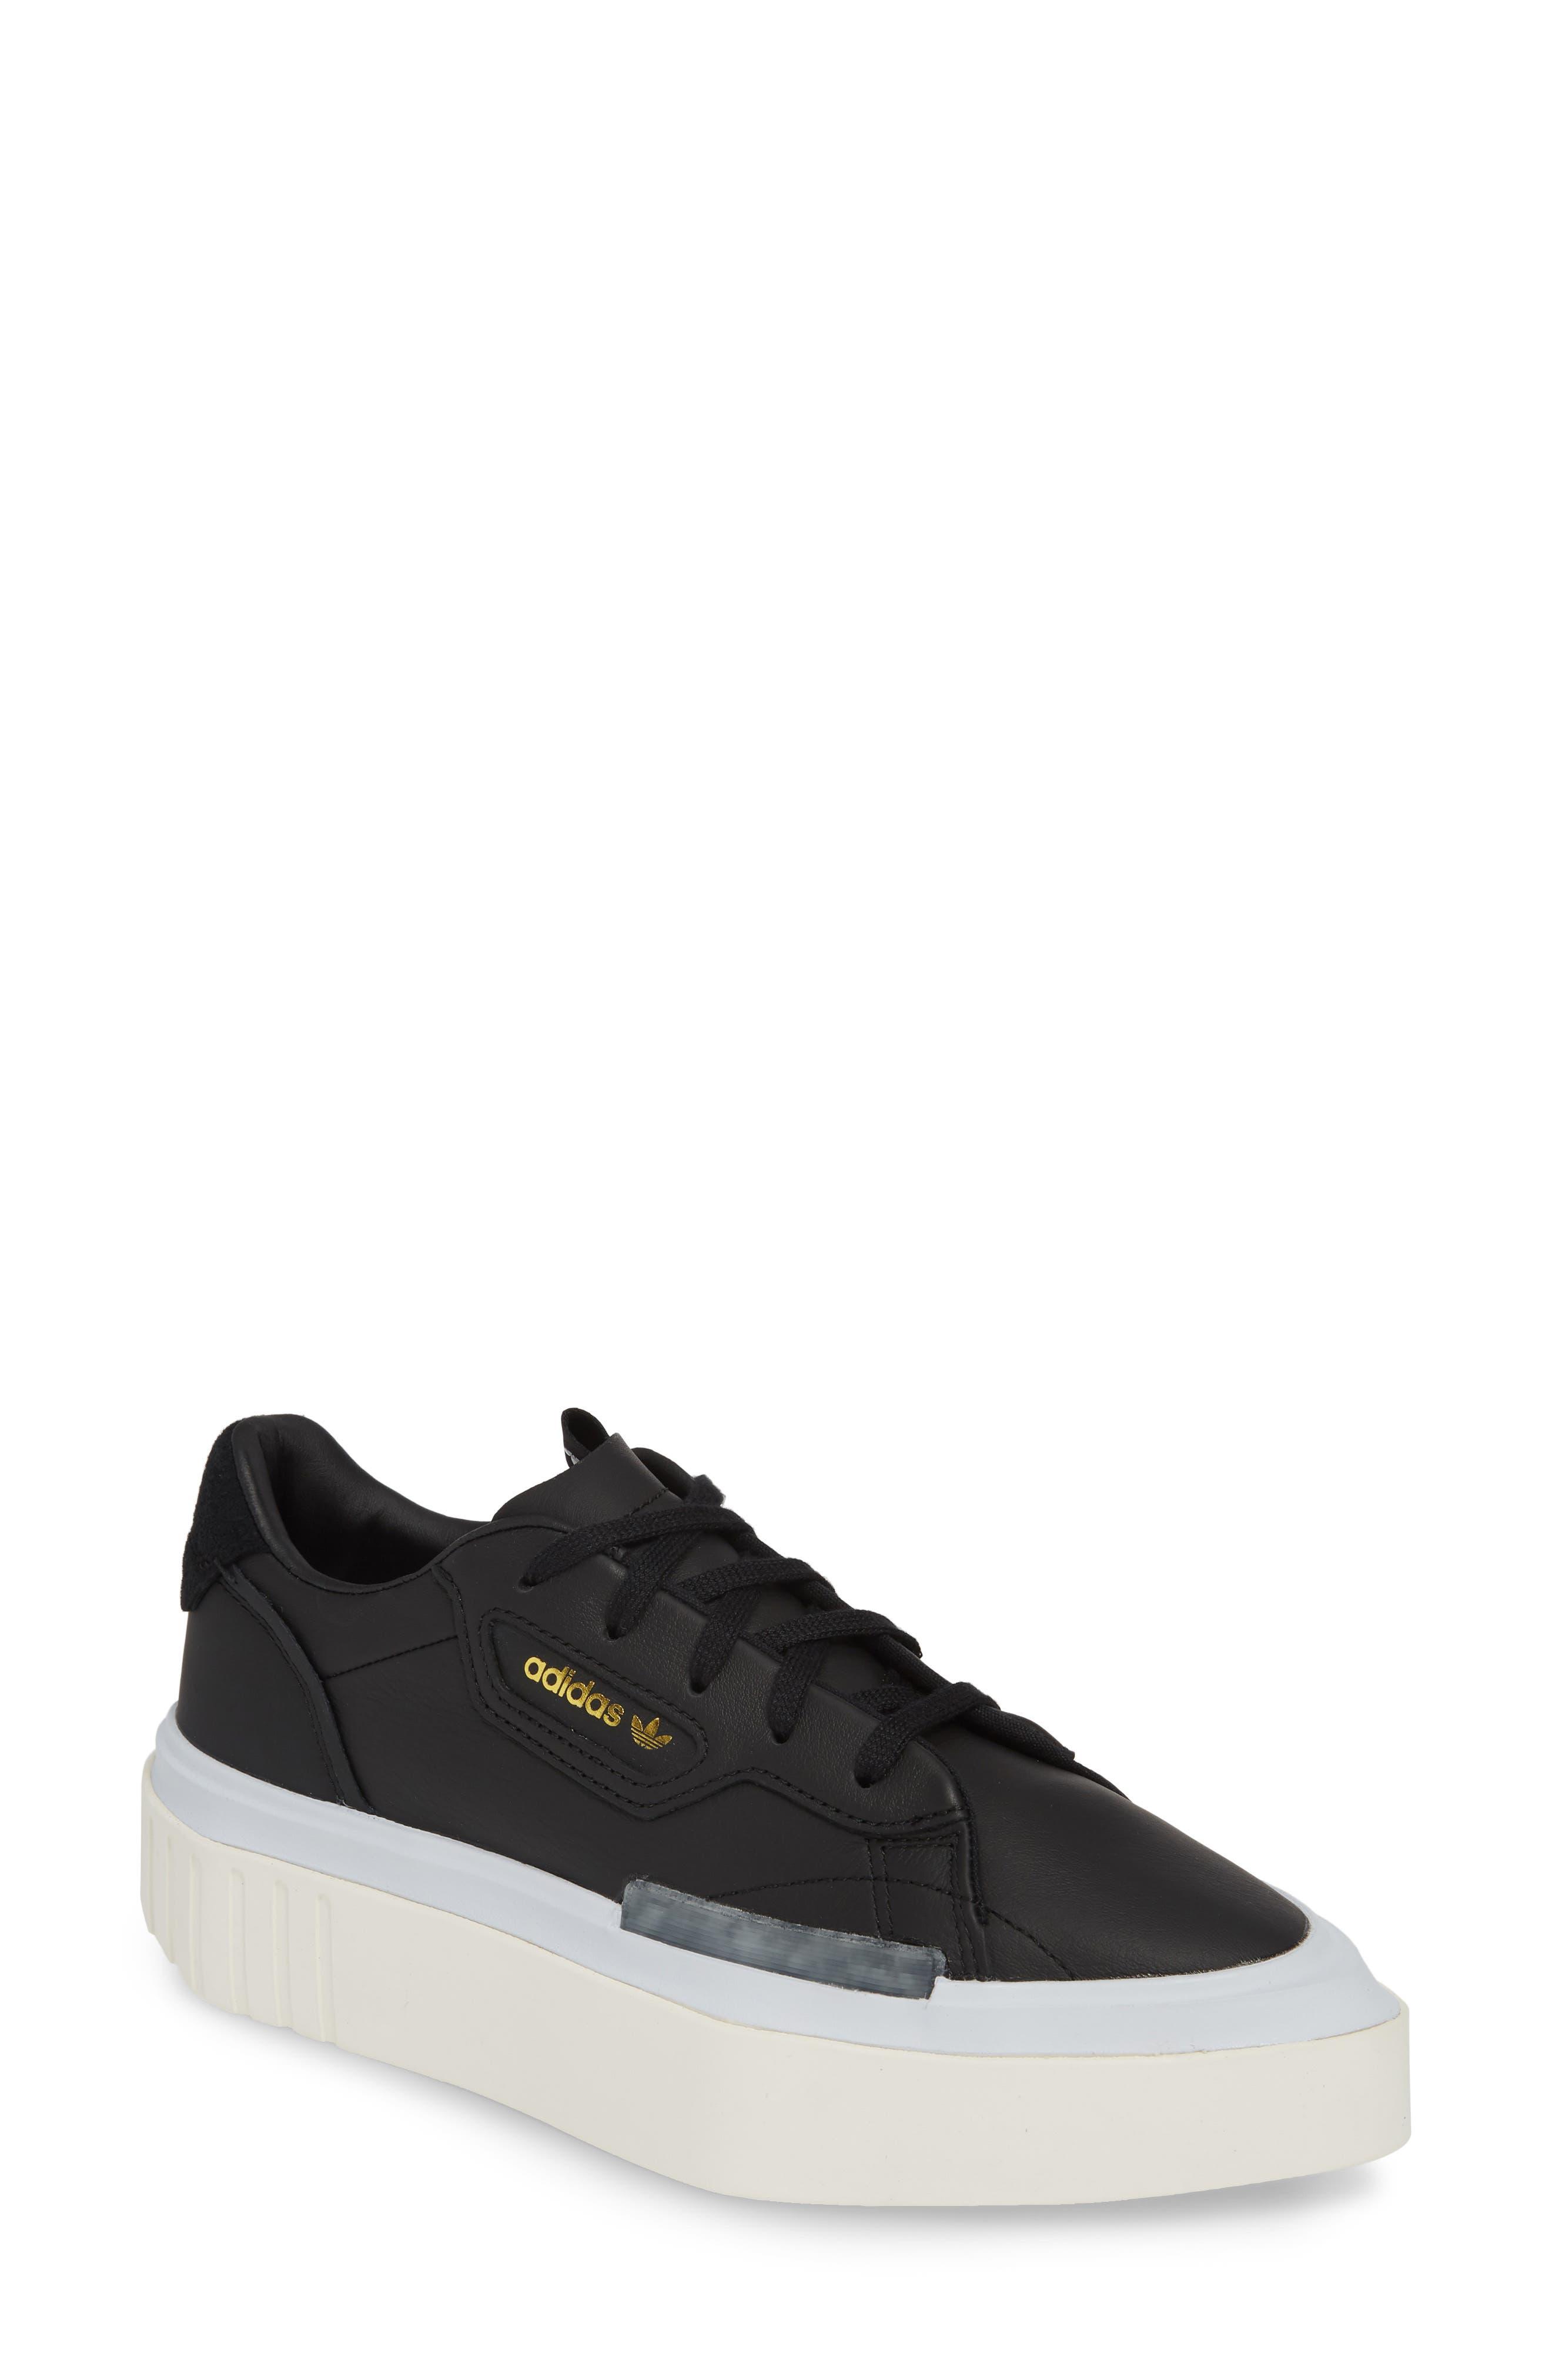 pretty nice c9540 d3b32 Adidas Girls Toddler Rapidarun Laceless Shoes